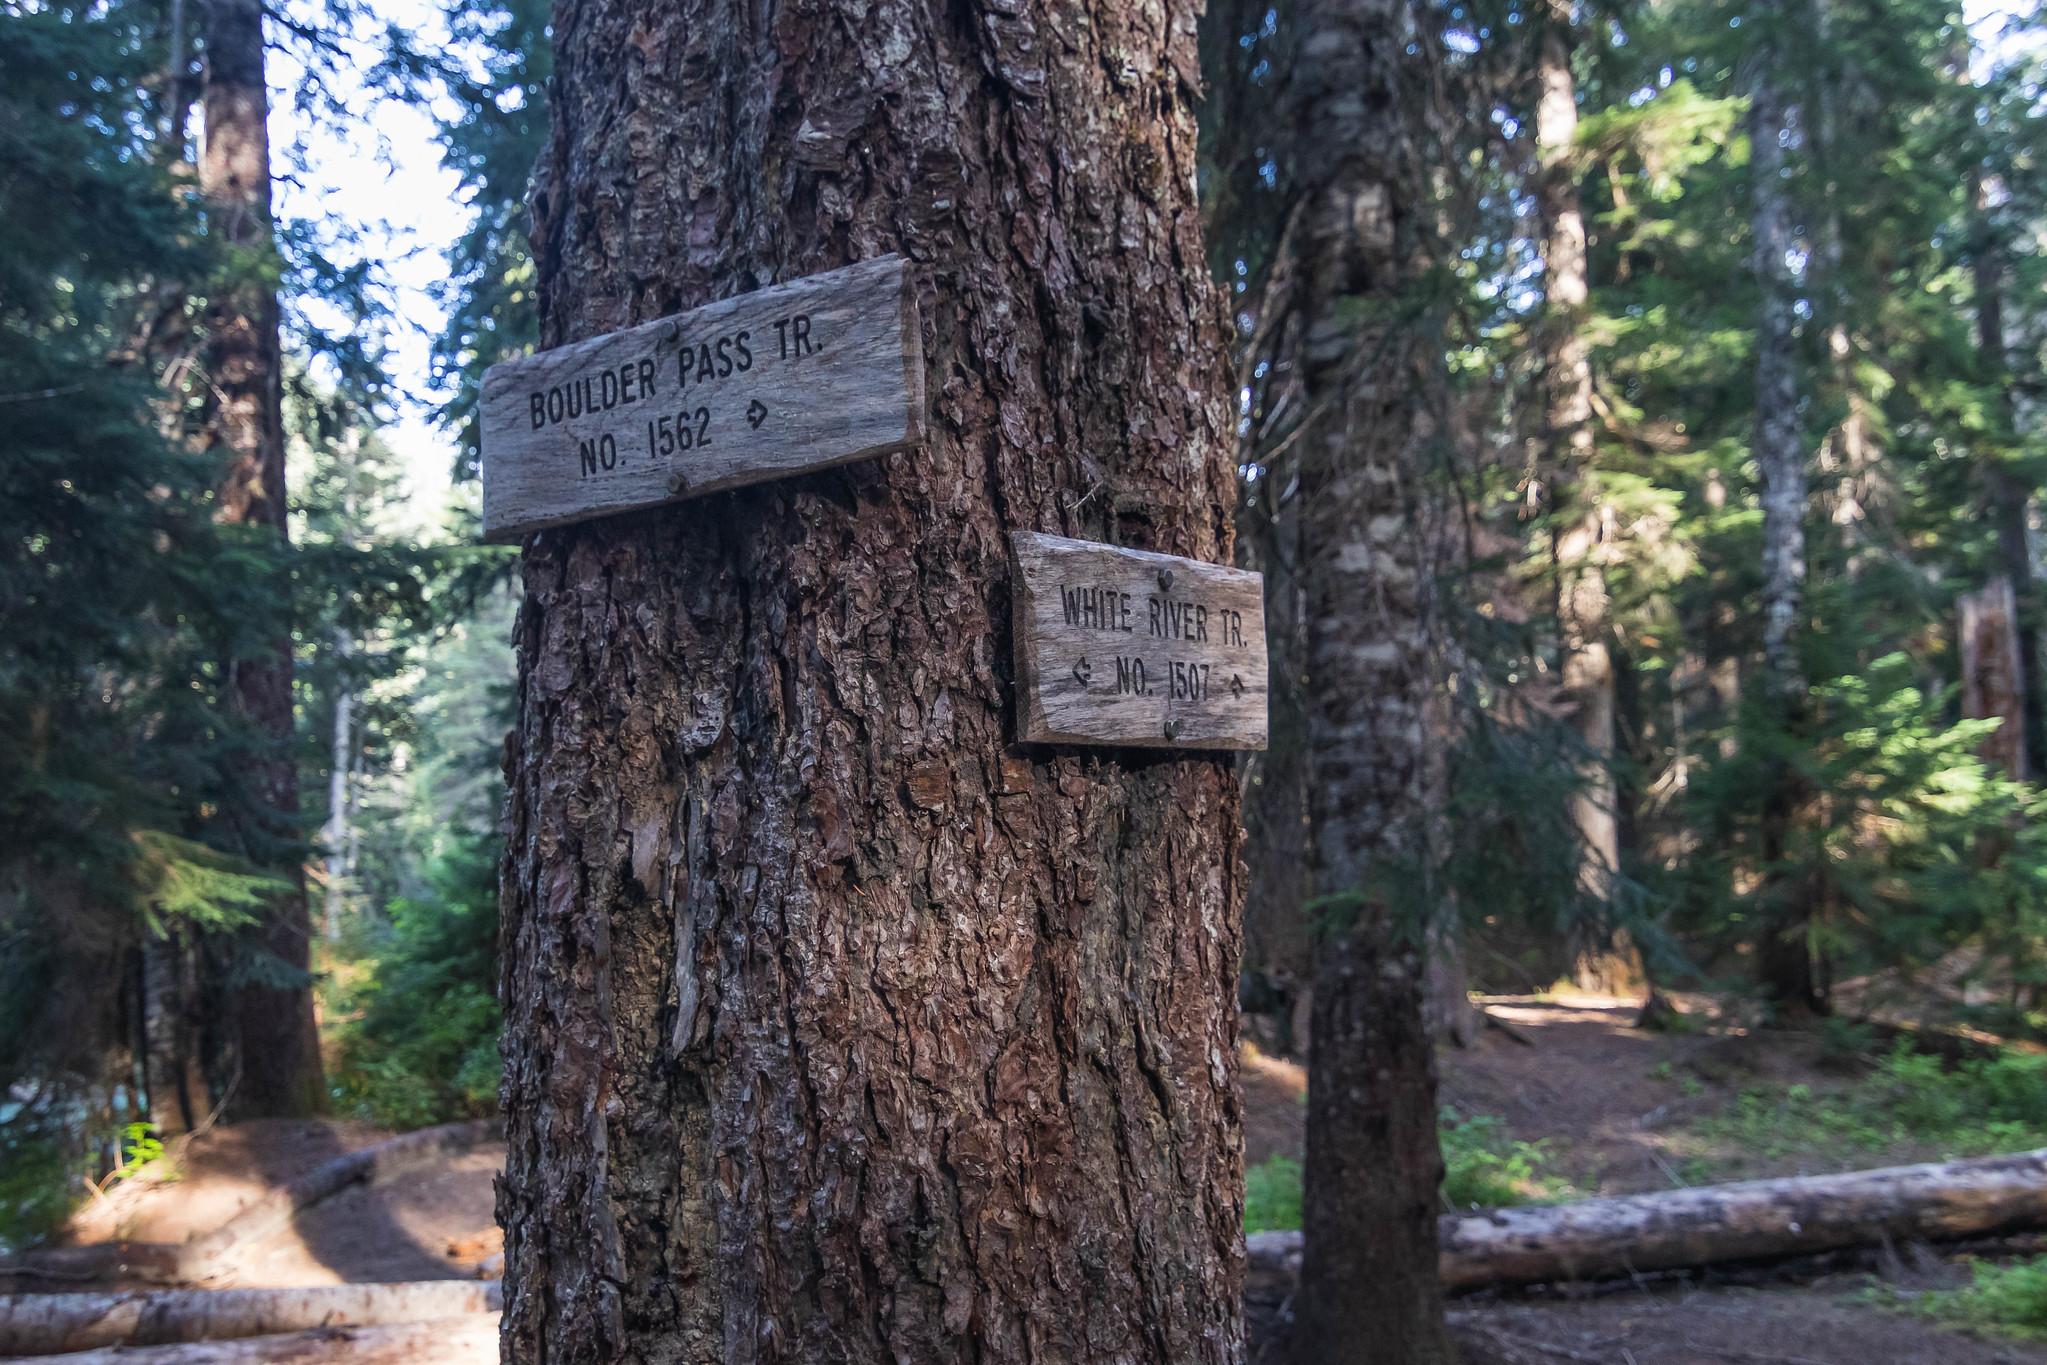 Boulder Pass Trail junction